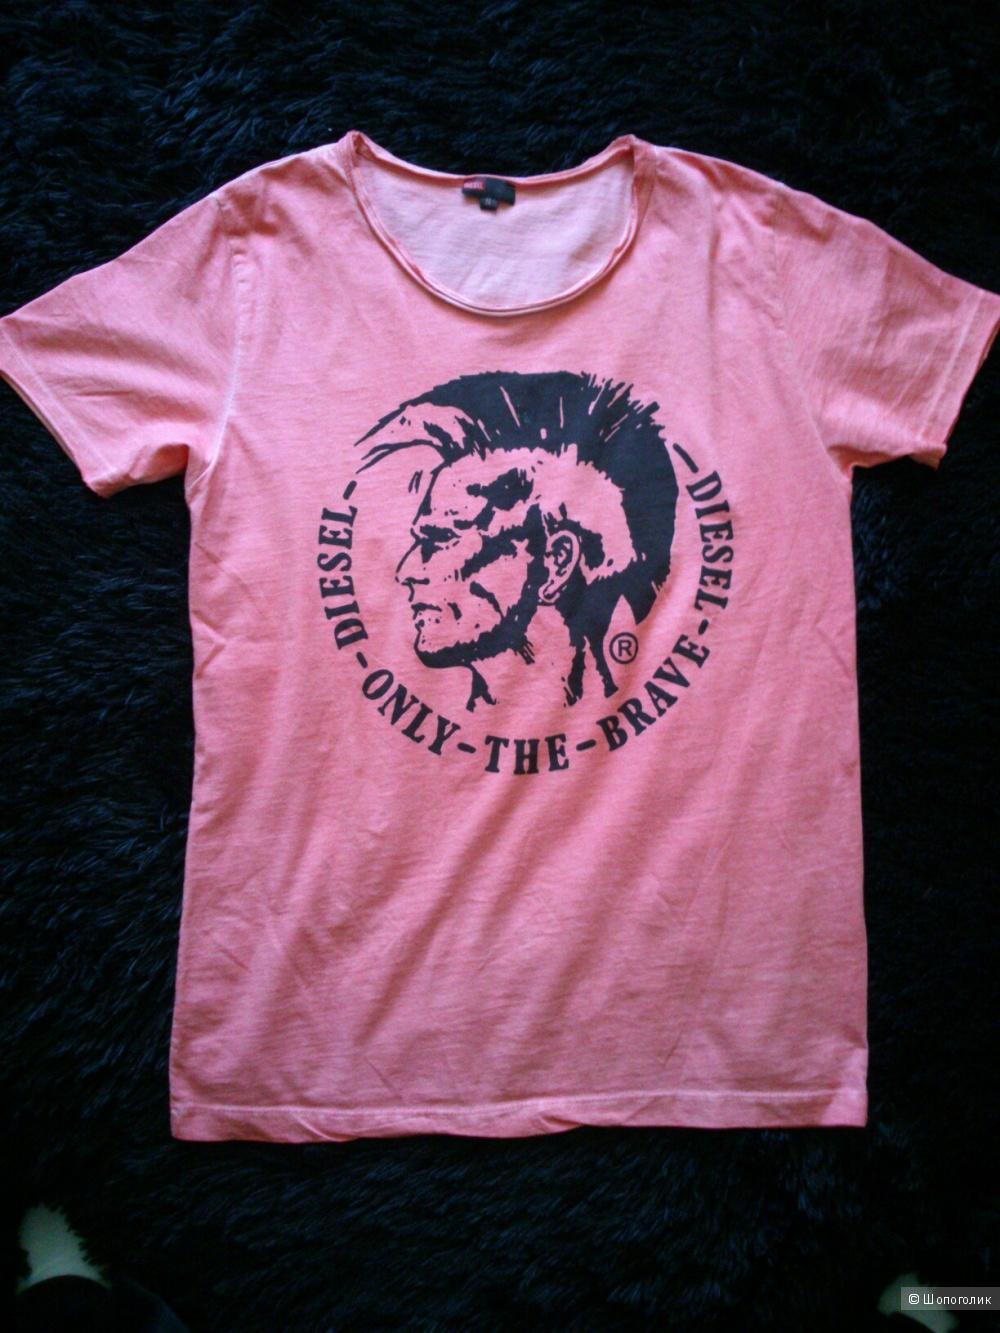 DIESEL, футболка (мужская, унисекс). Размер: S (на 46-48).